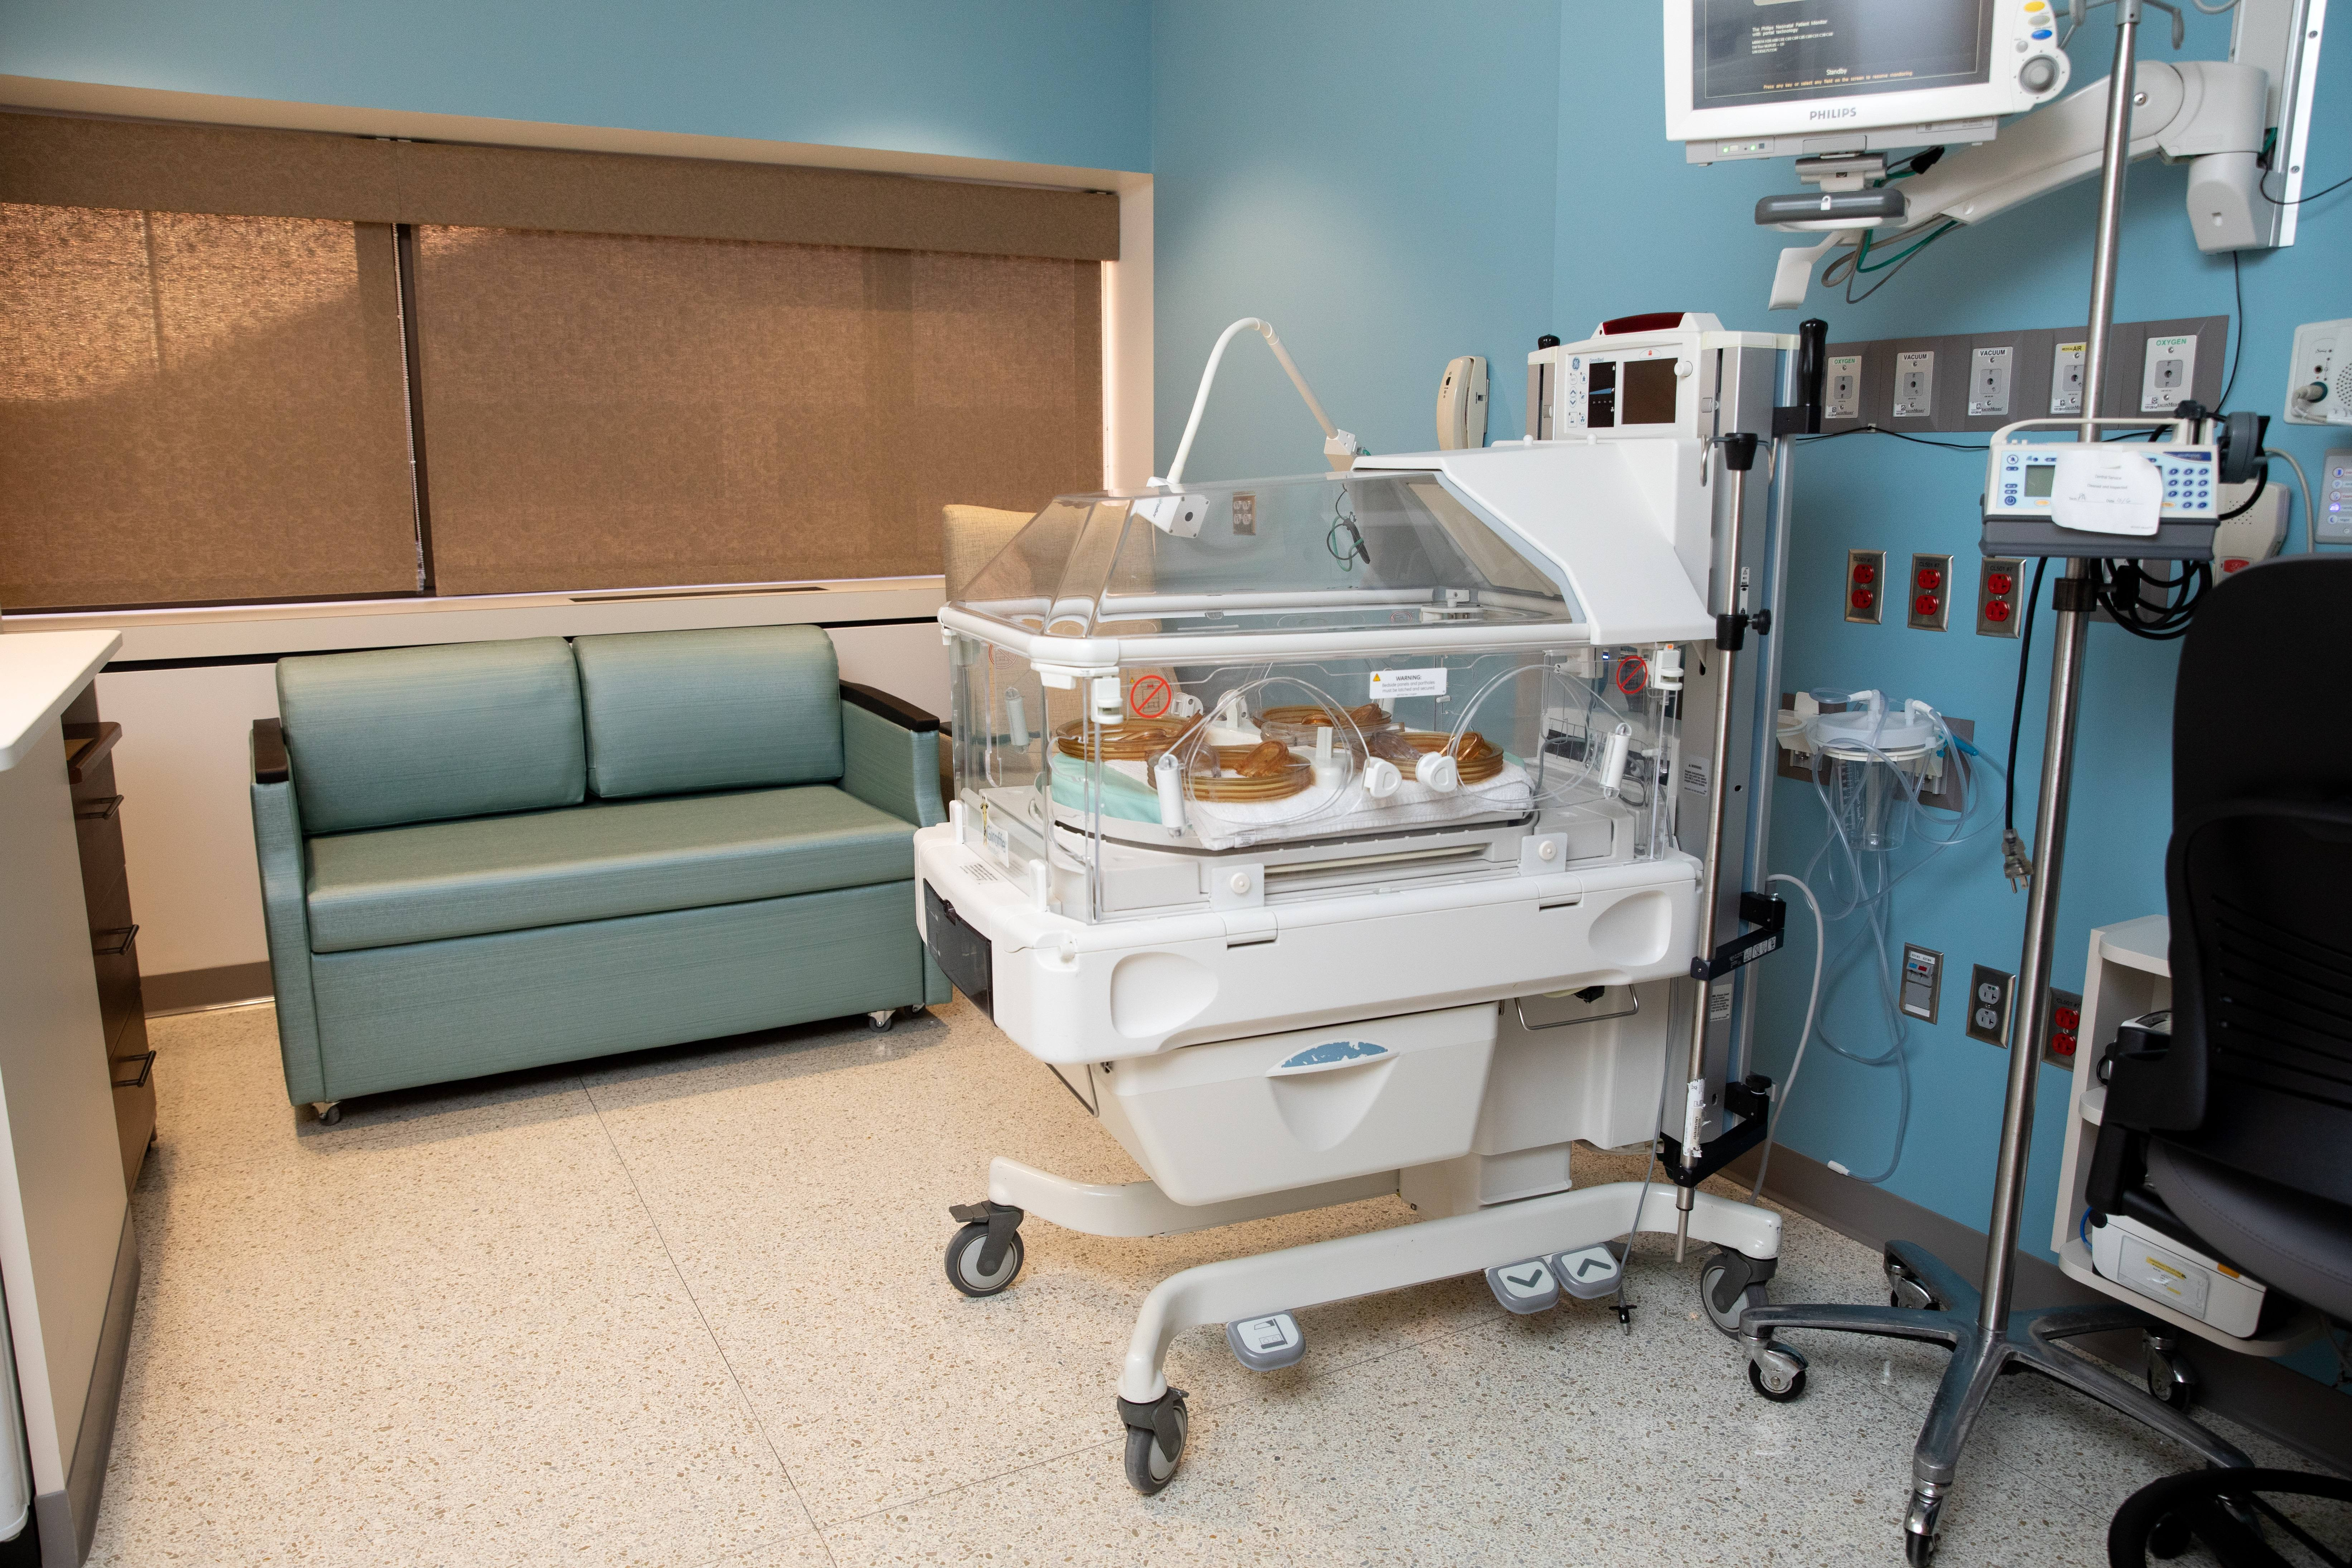 NICU room with monitors and incubator